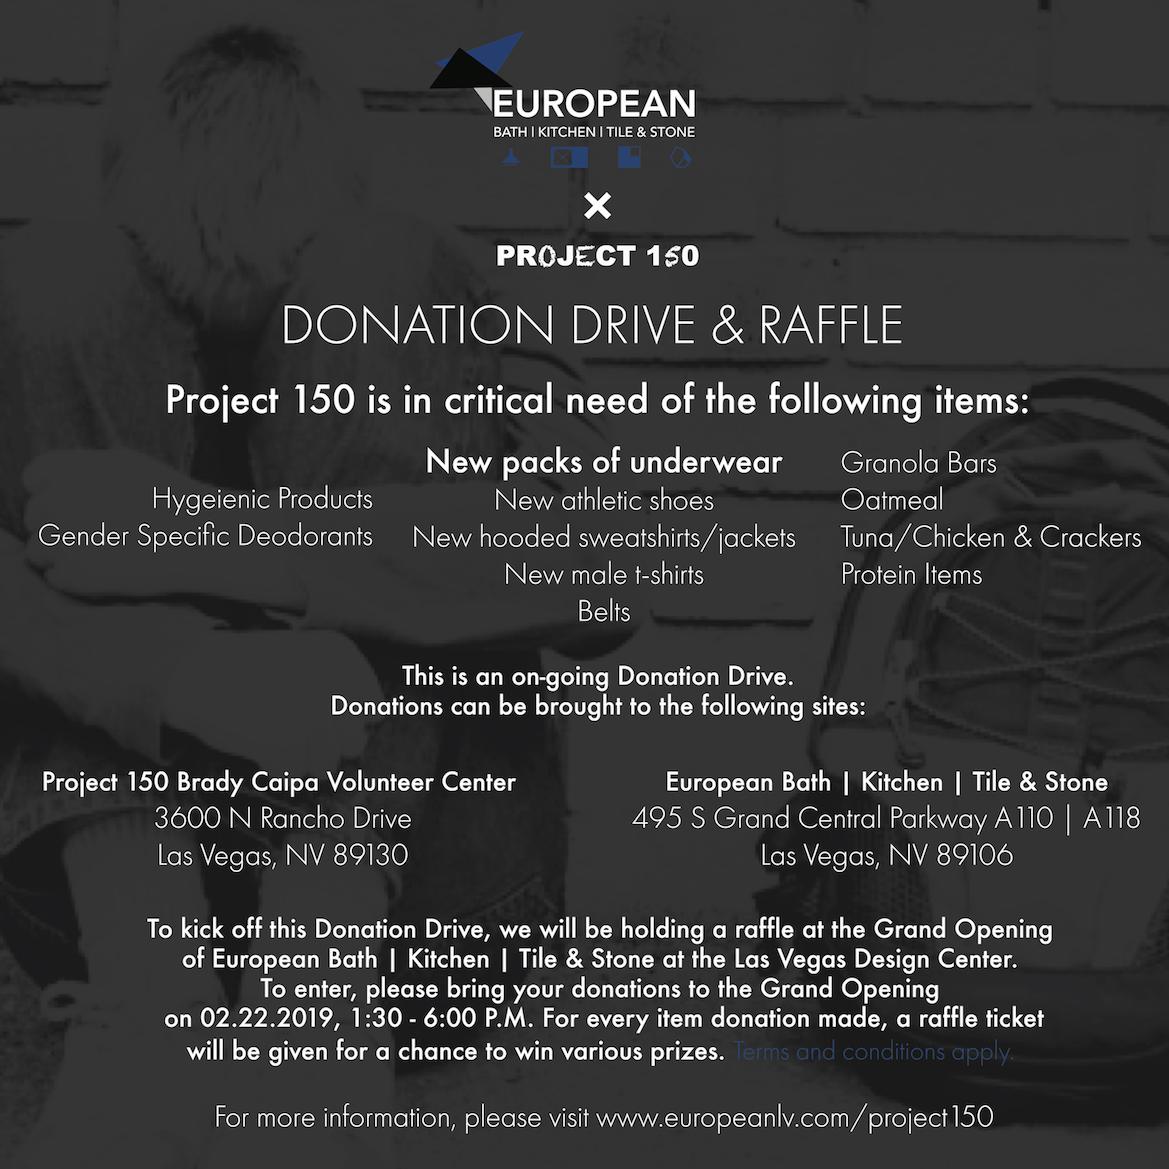 EBKTS Donation Drive and Raffle.png